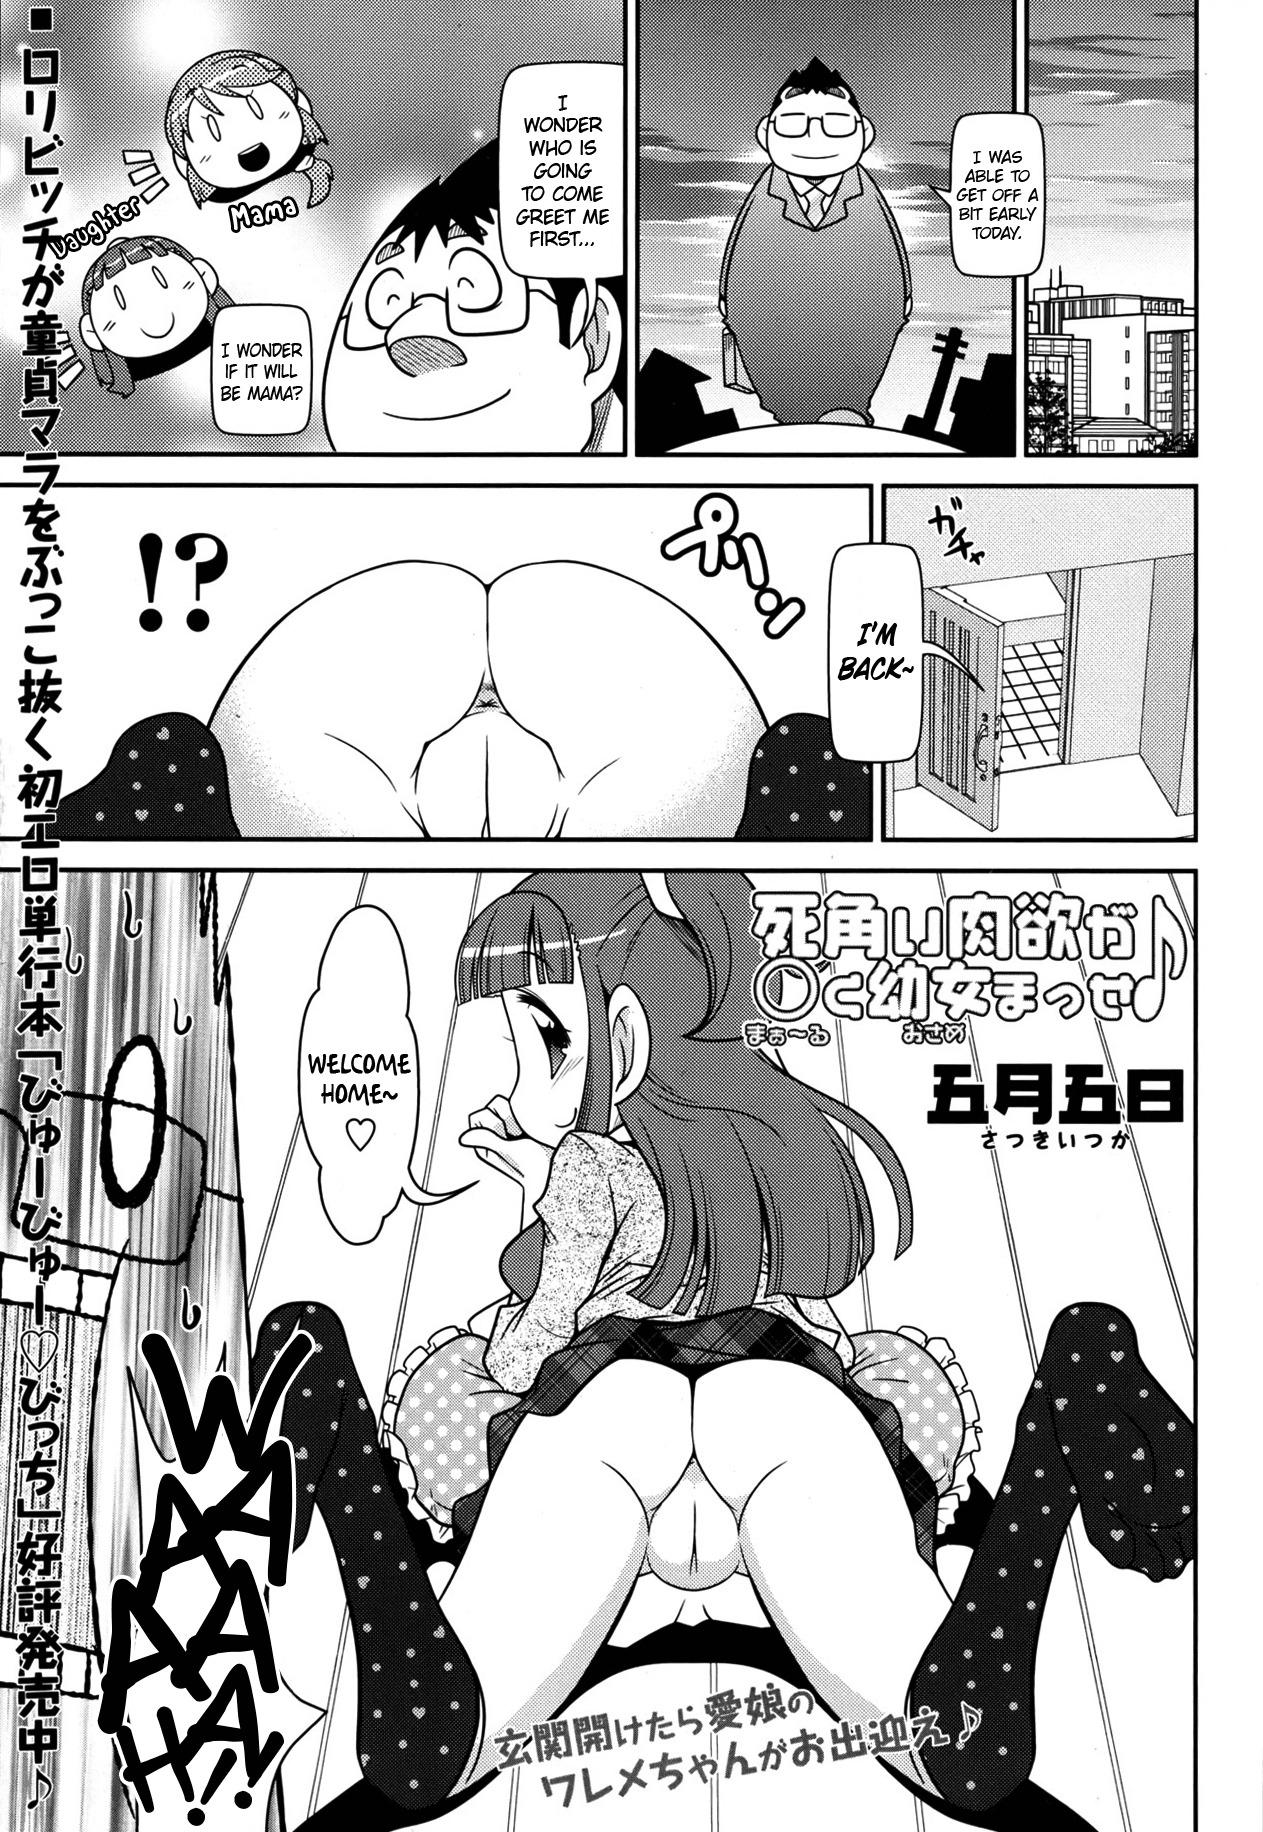 Shikakui Nikuyoku ga Maaruku Osame masse♪ | A Young Girl's Secret Lust page 1